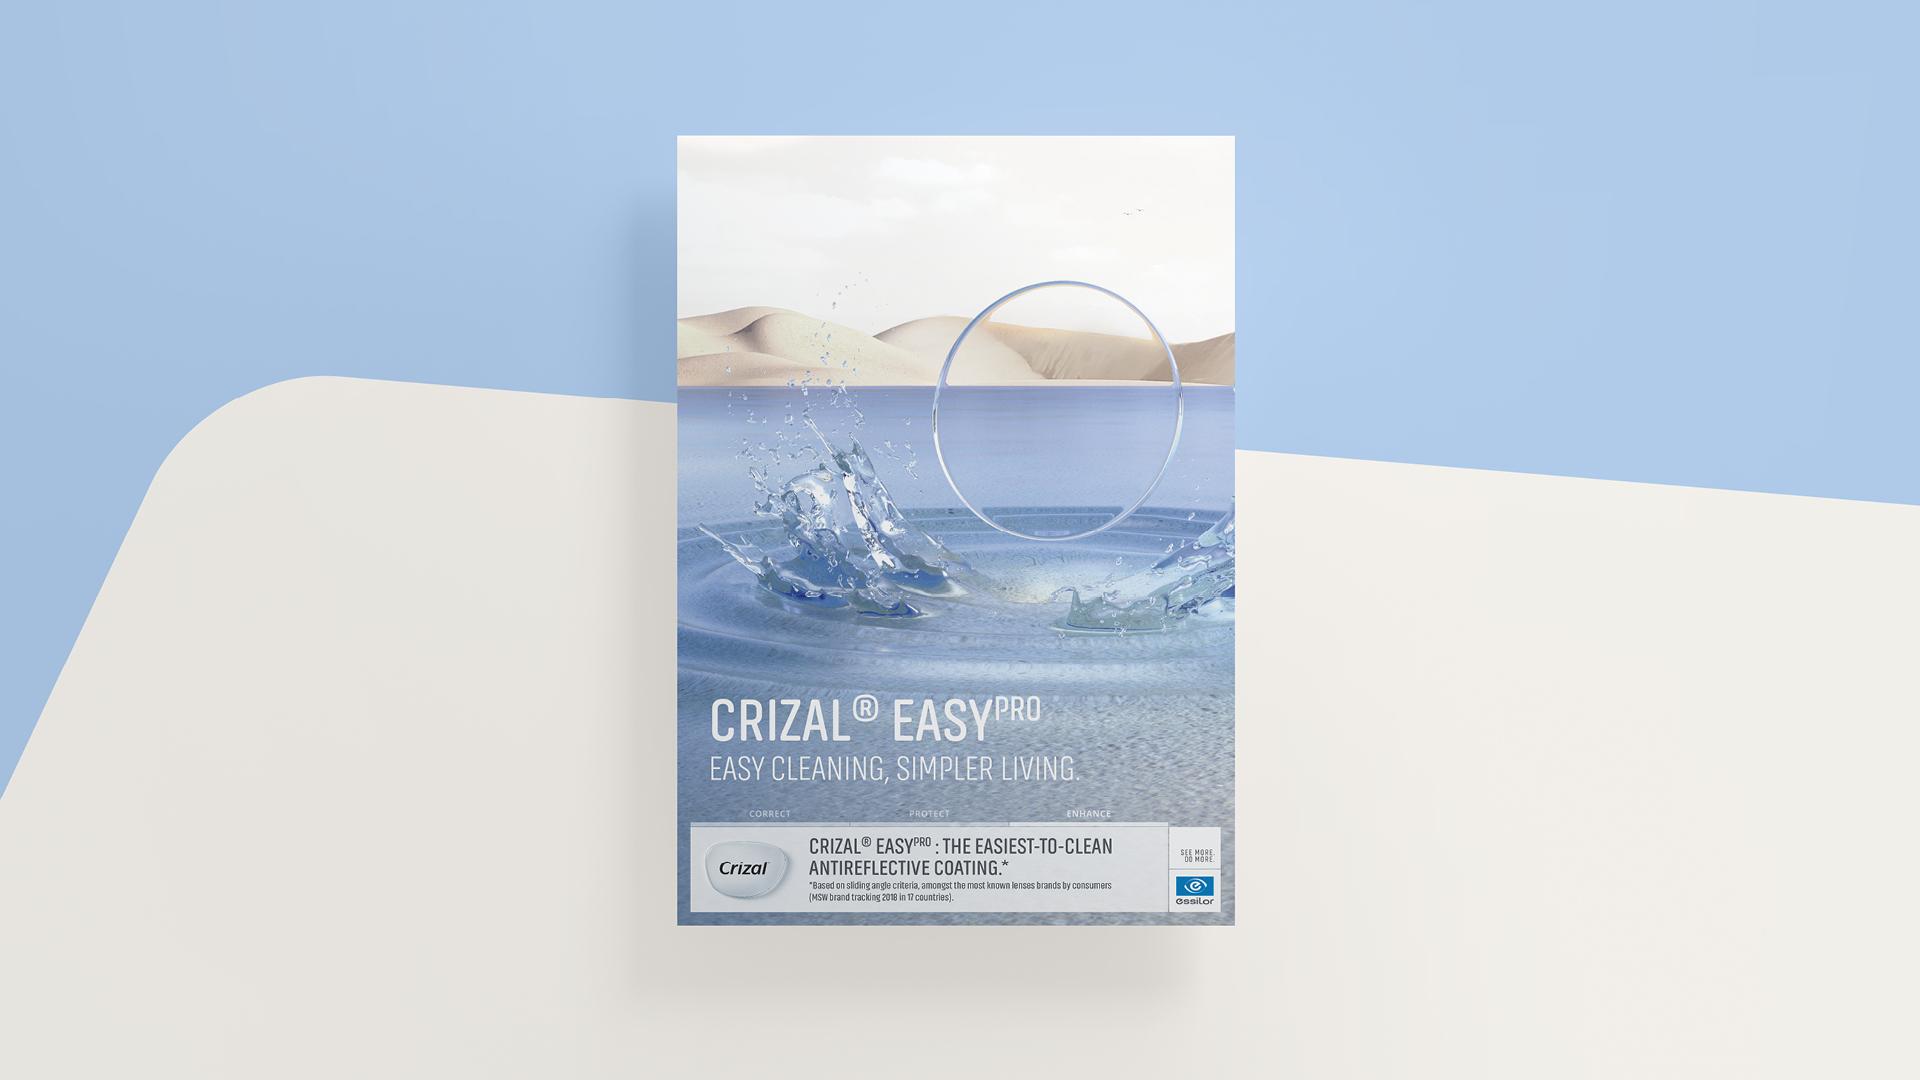 crizaleasypro_casclient10